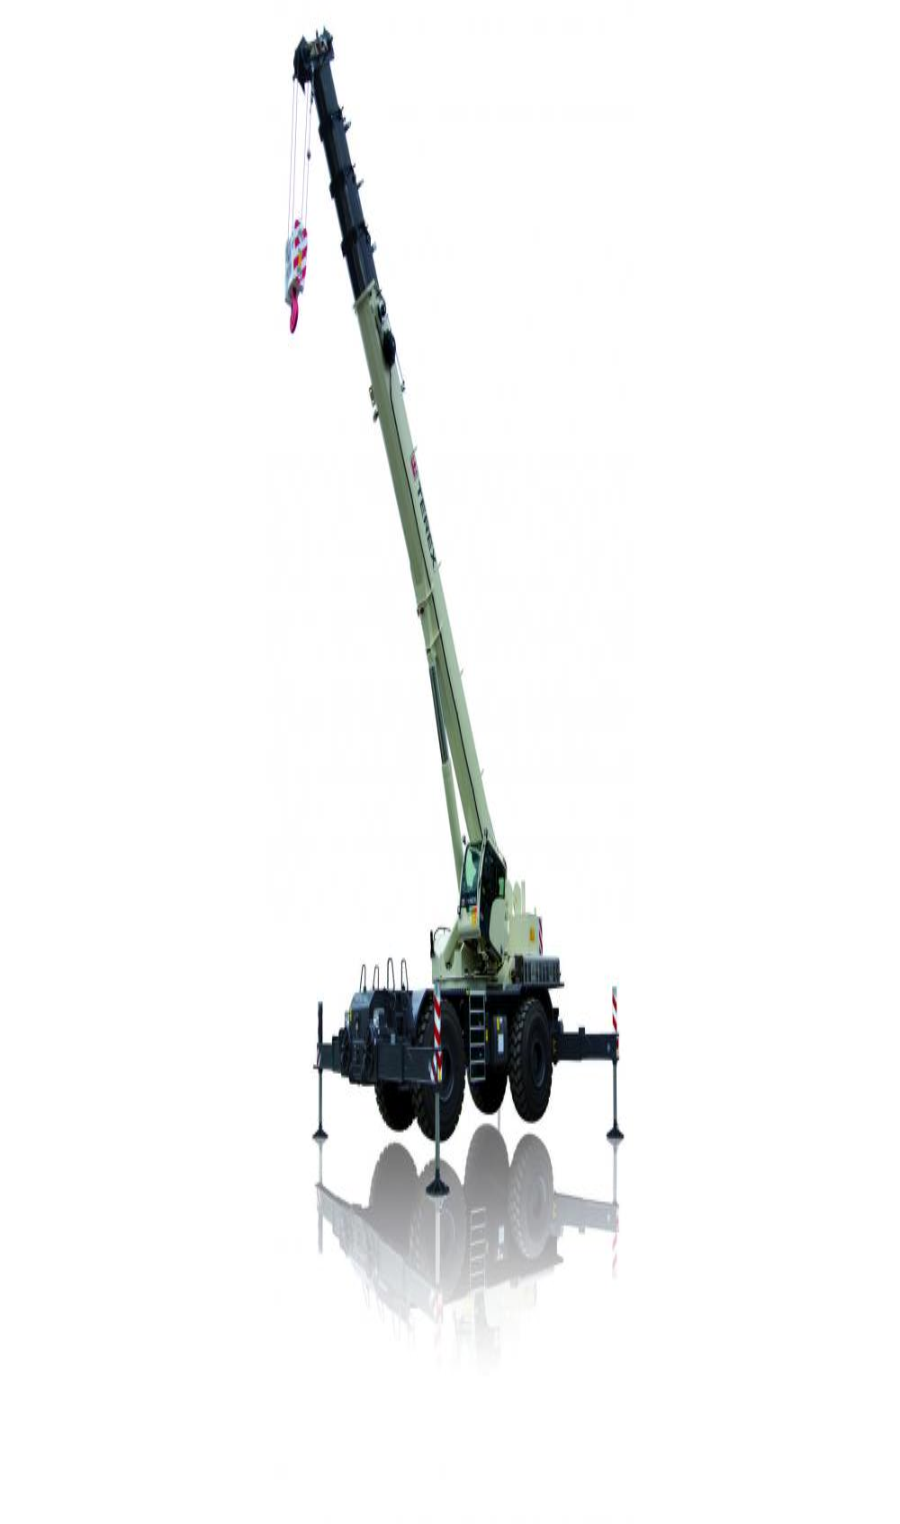 Terex RT 100US rough terrain crane.